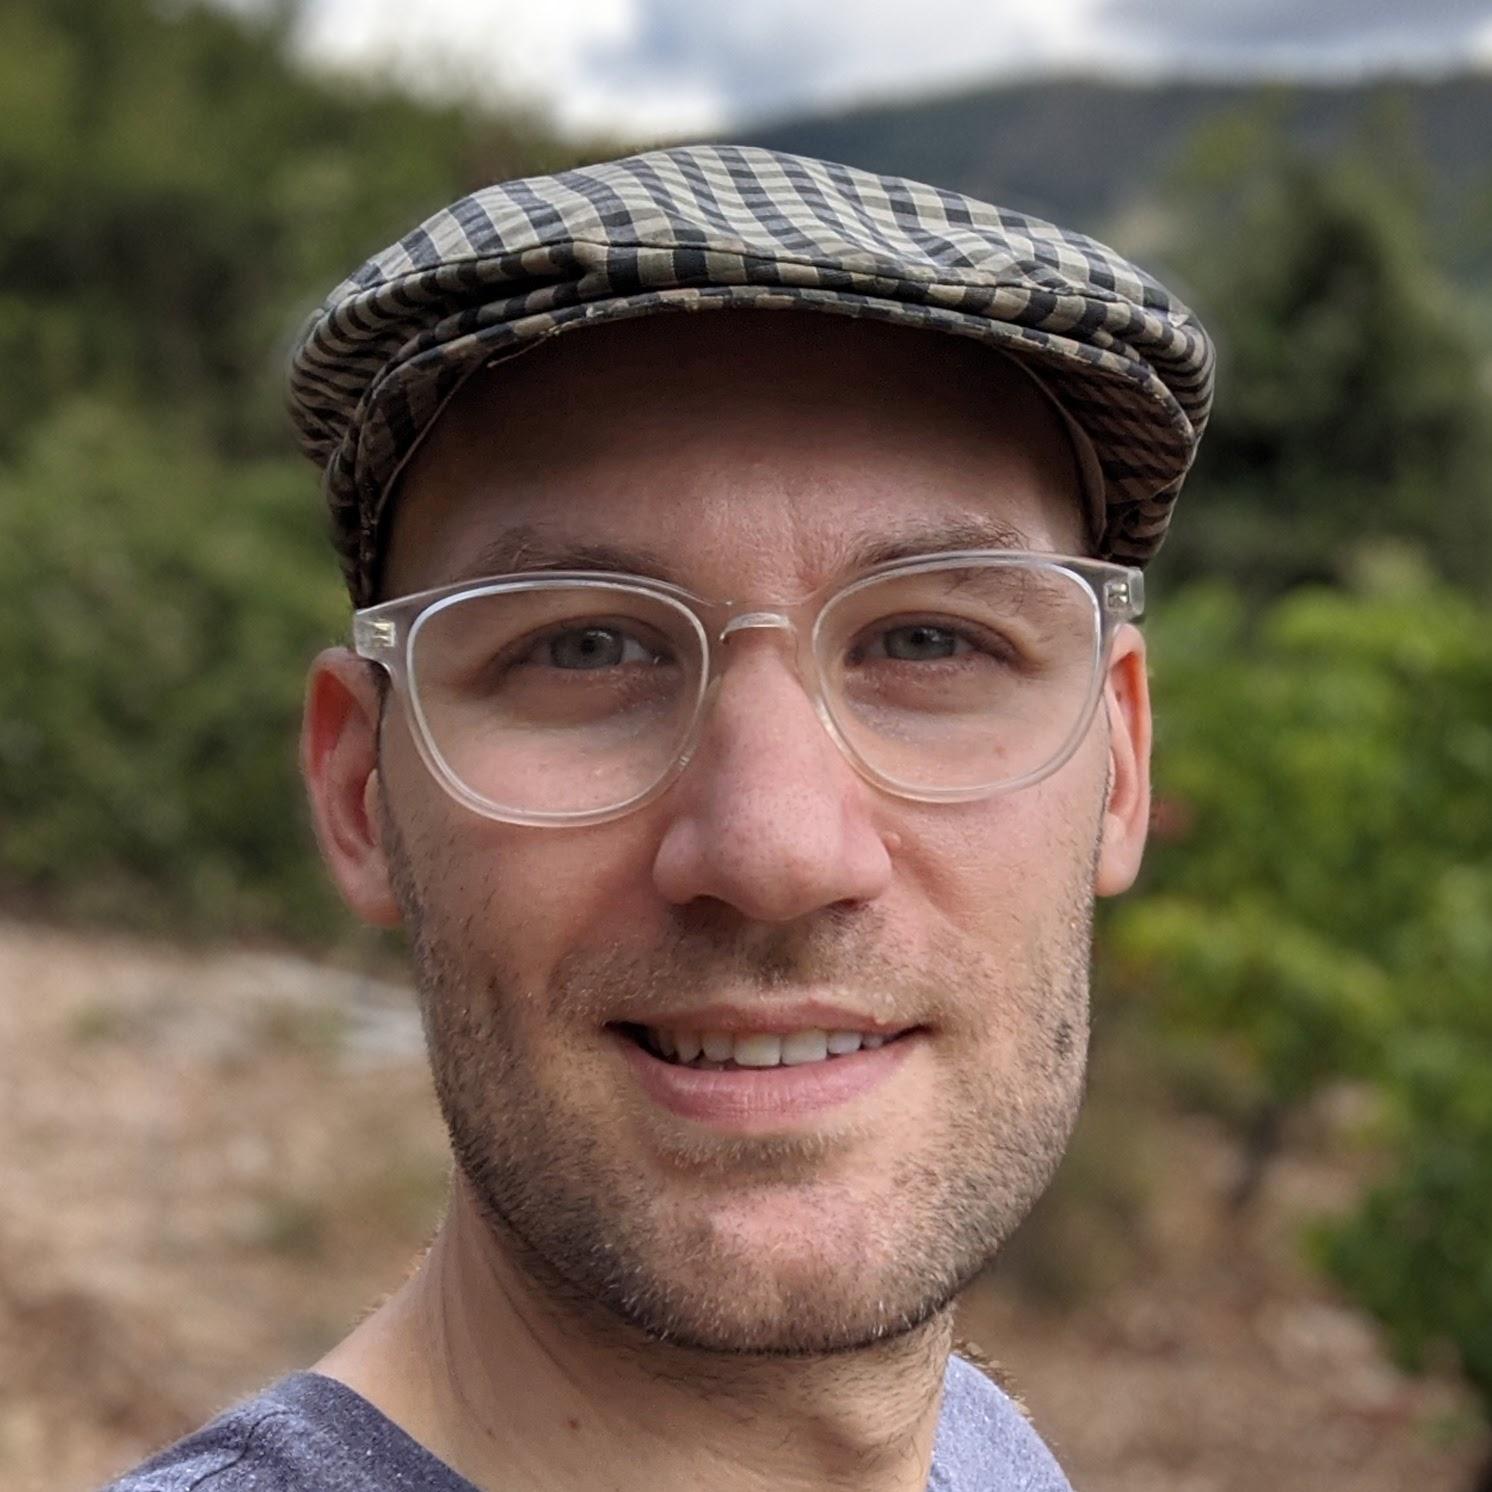 Fabian-Robert Stöter